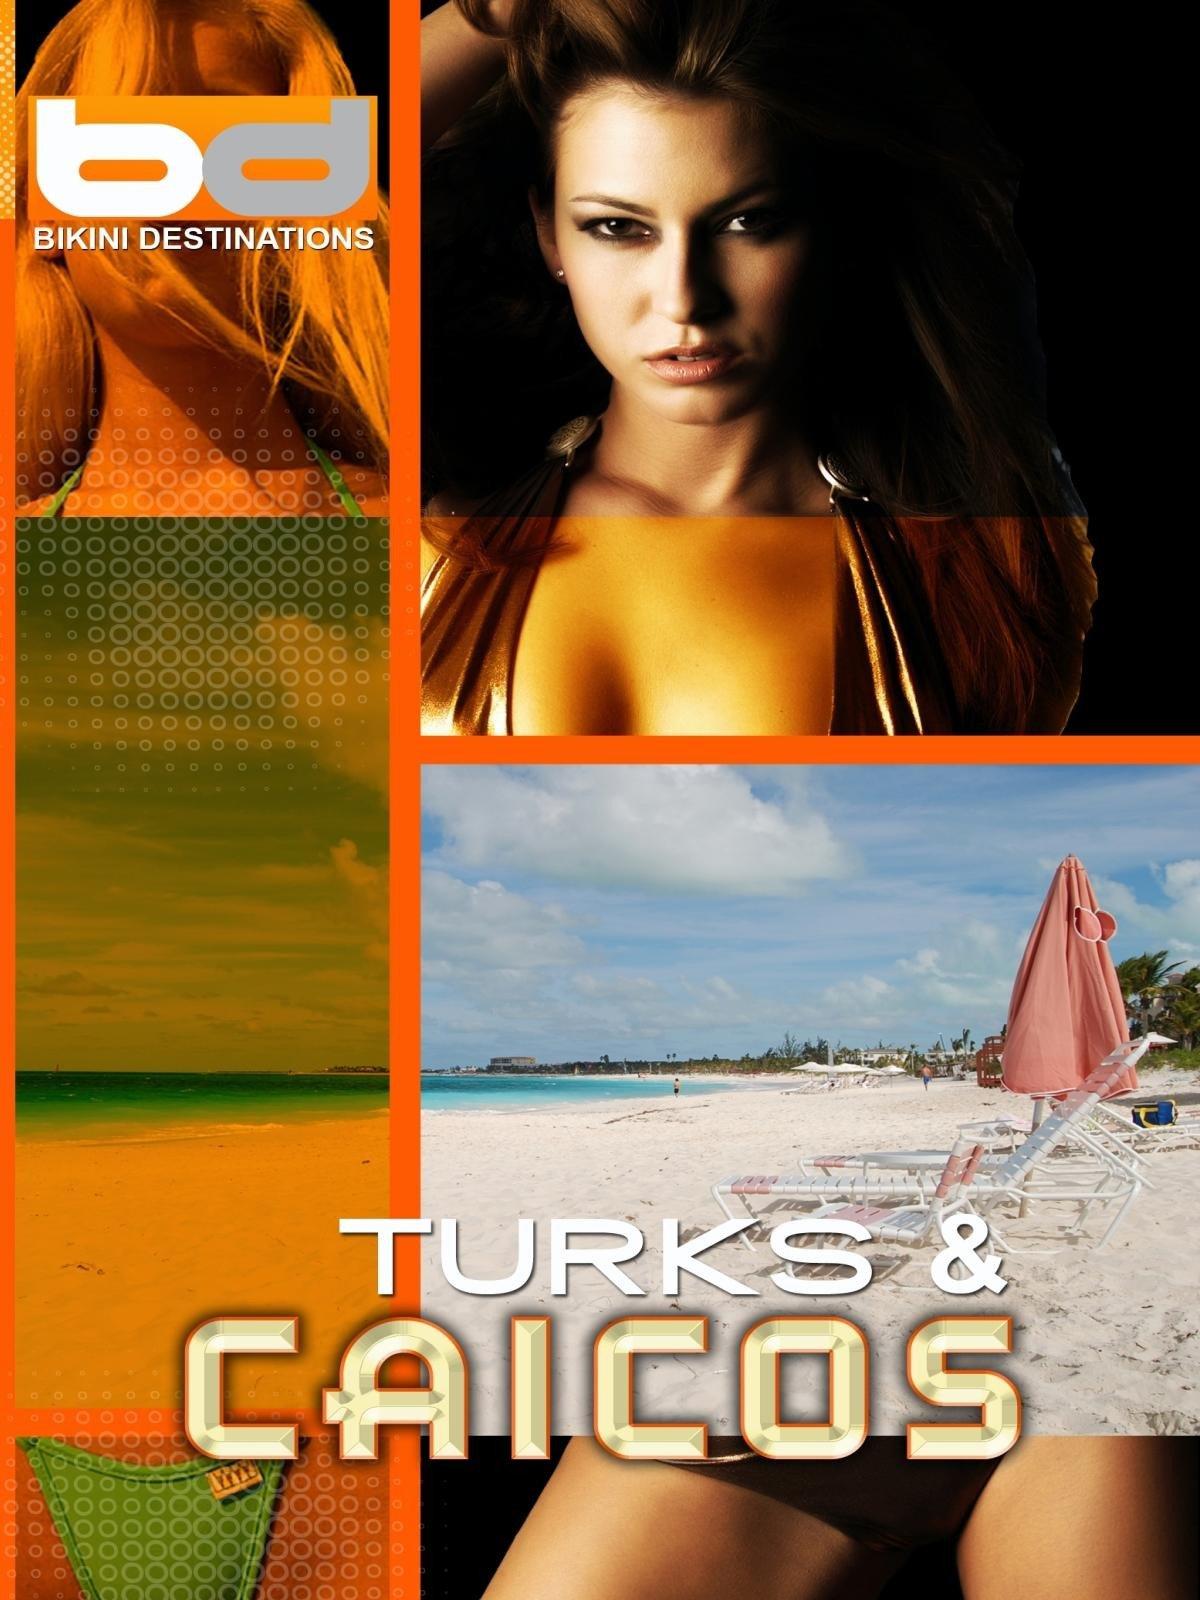 Bikini Destination - Turks and Caicos